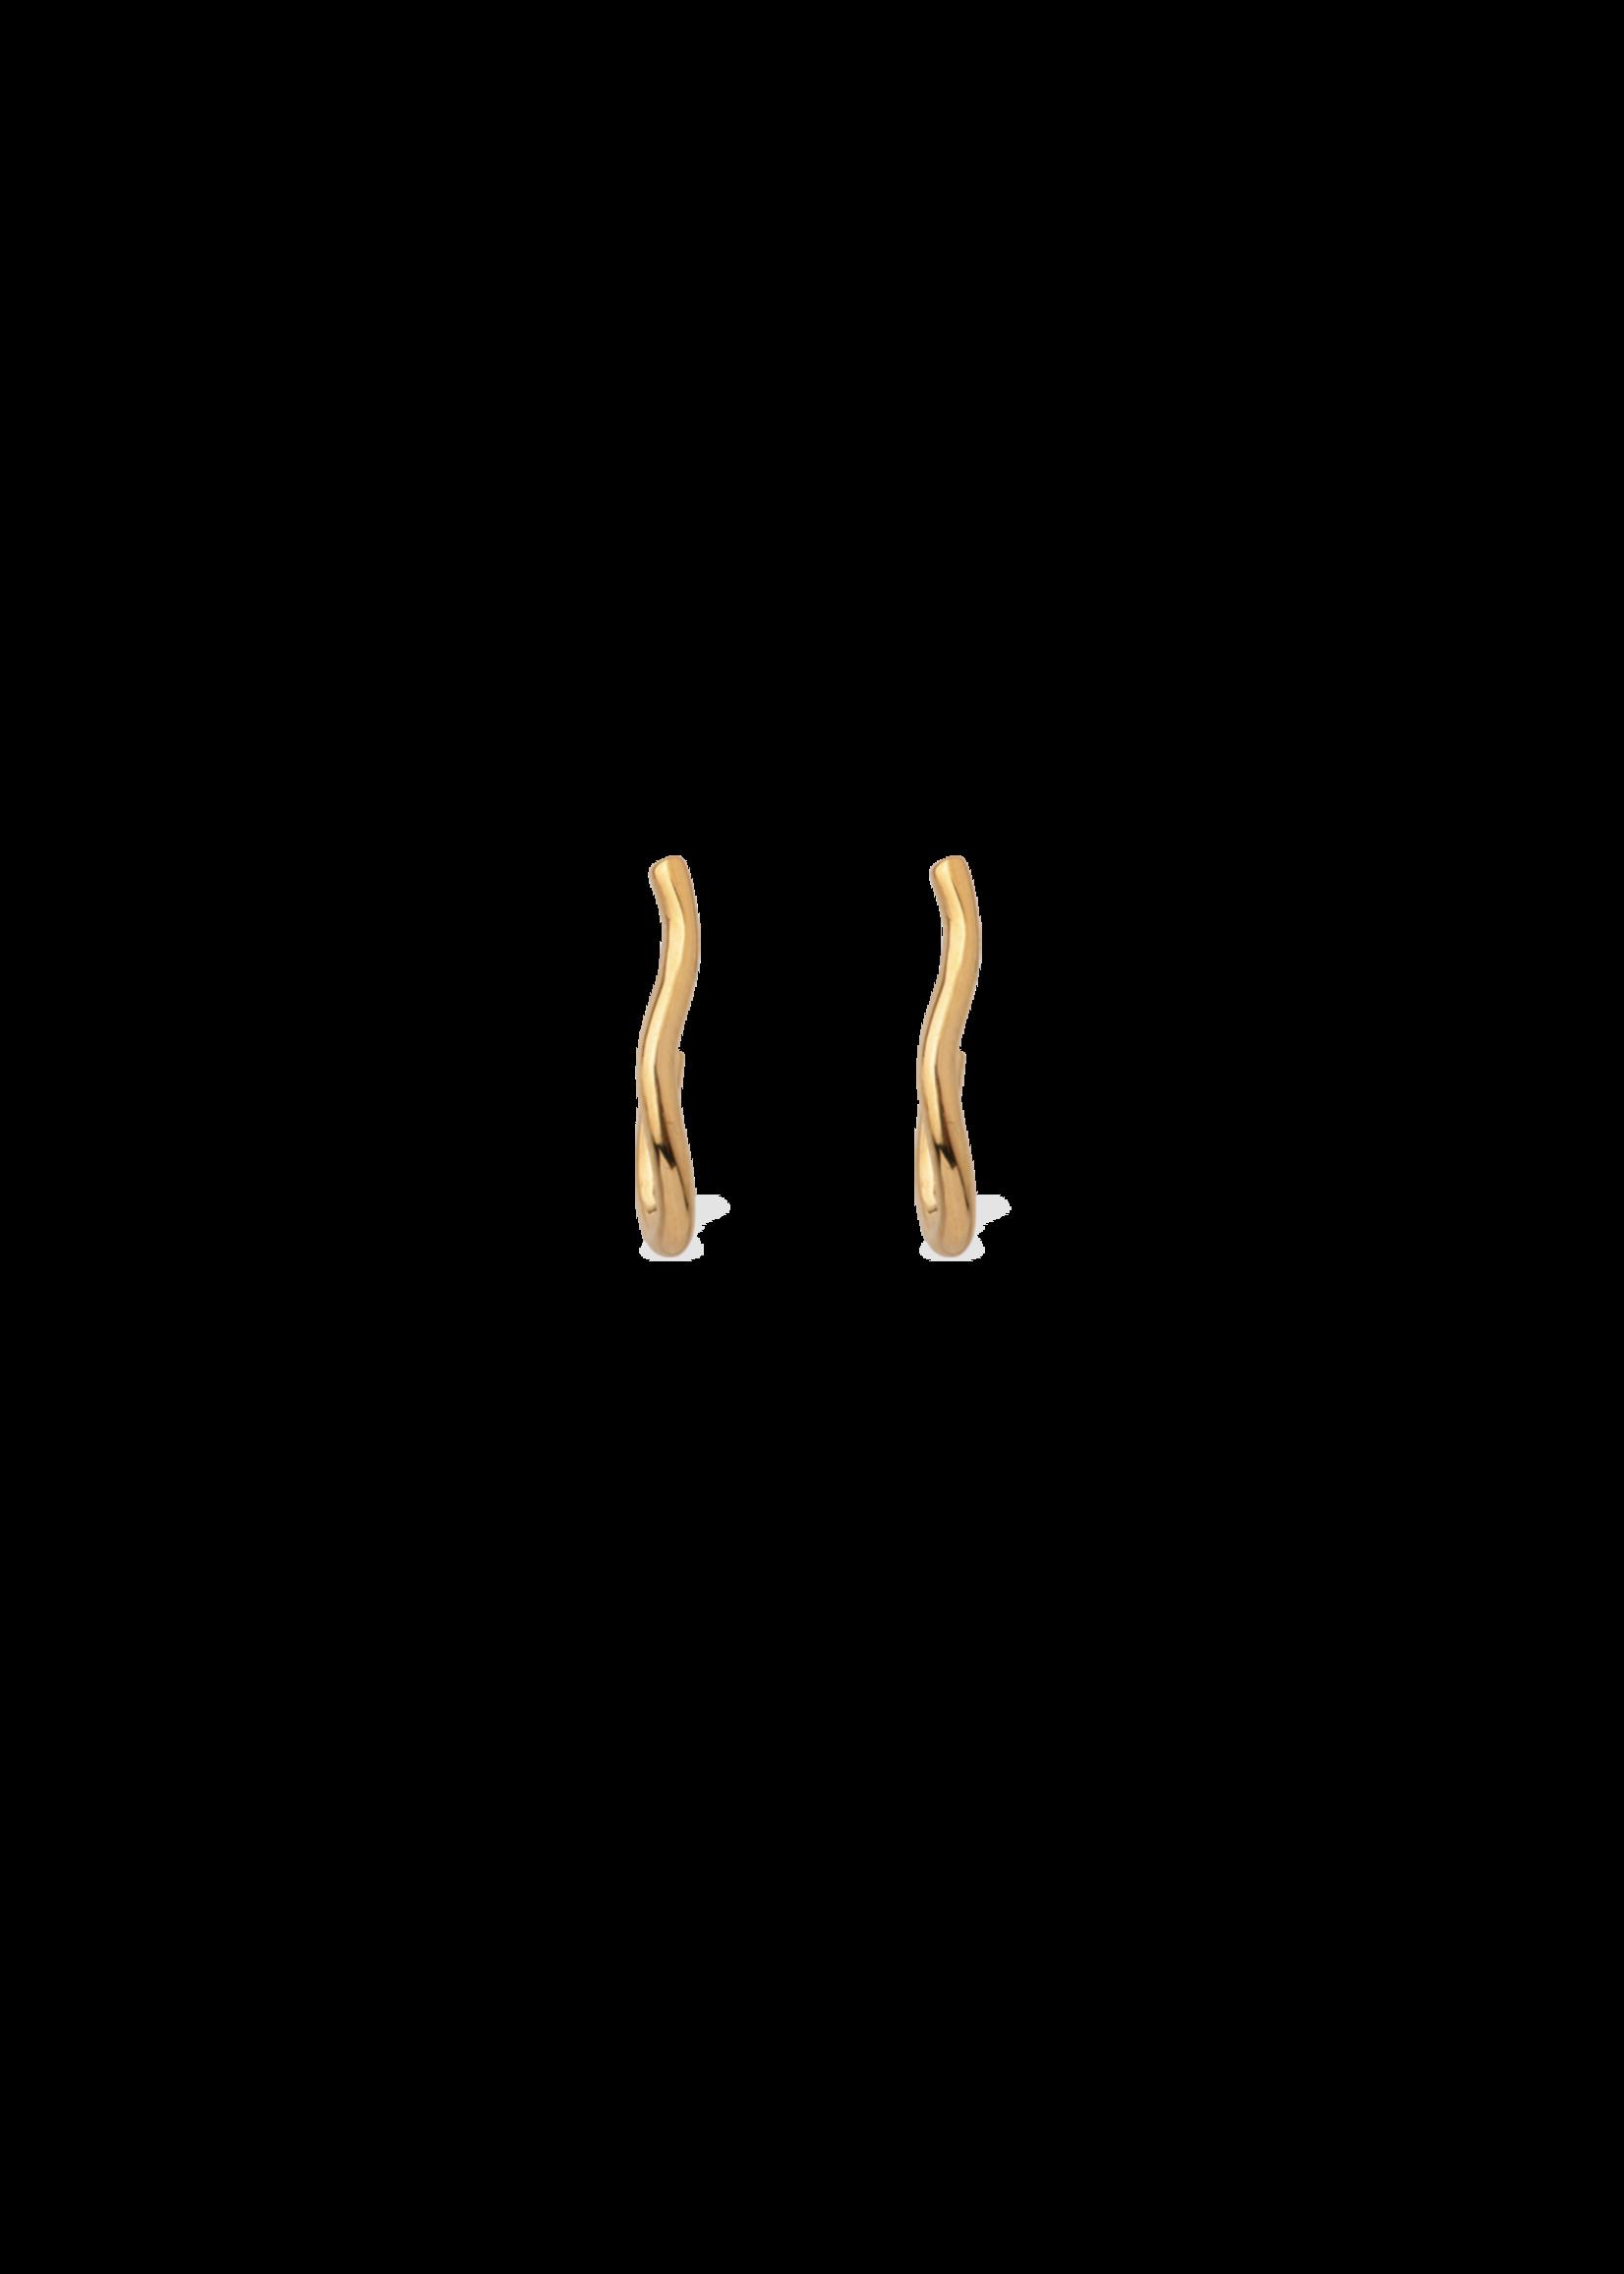 Completed Works Fall II Gold Vermeil Earrings